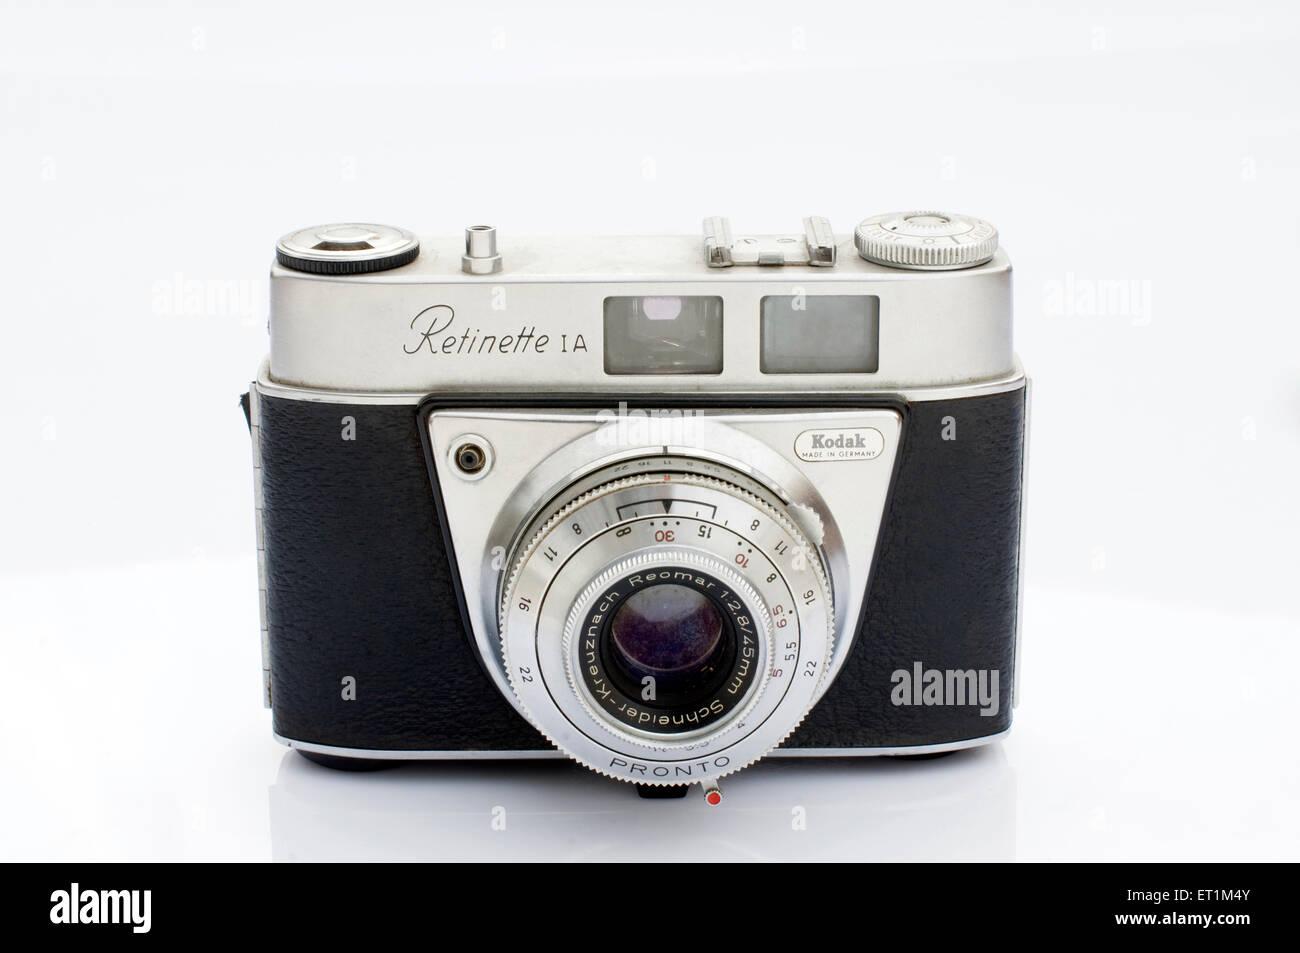 Un Kodak Retinette 1A Pune Maharashtra Inde caméra film Asie Photo Stock